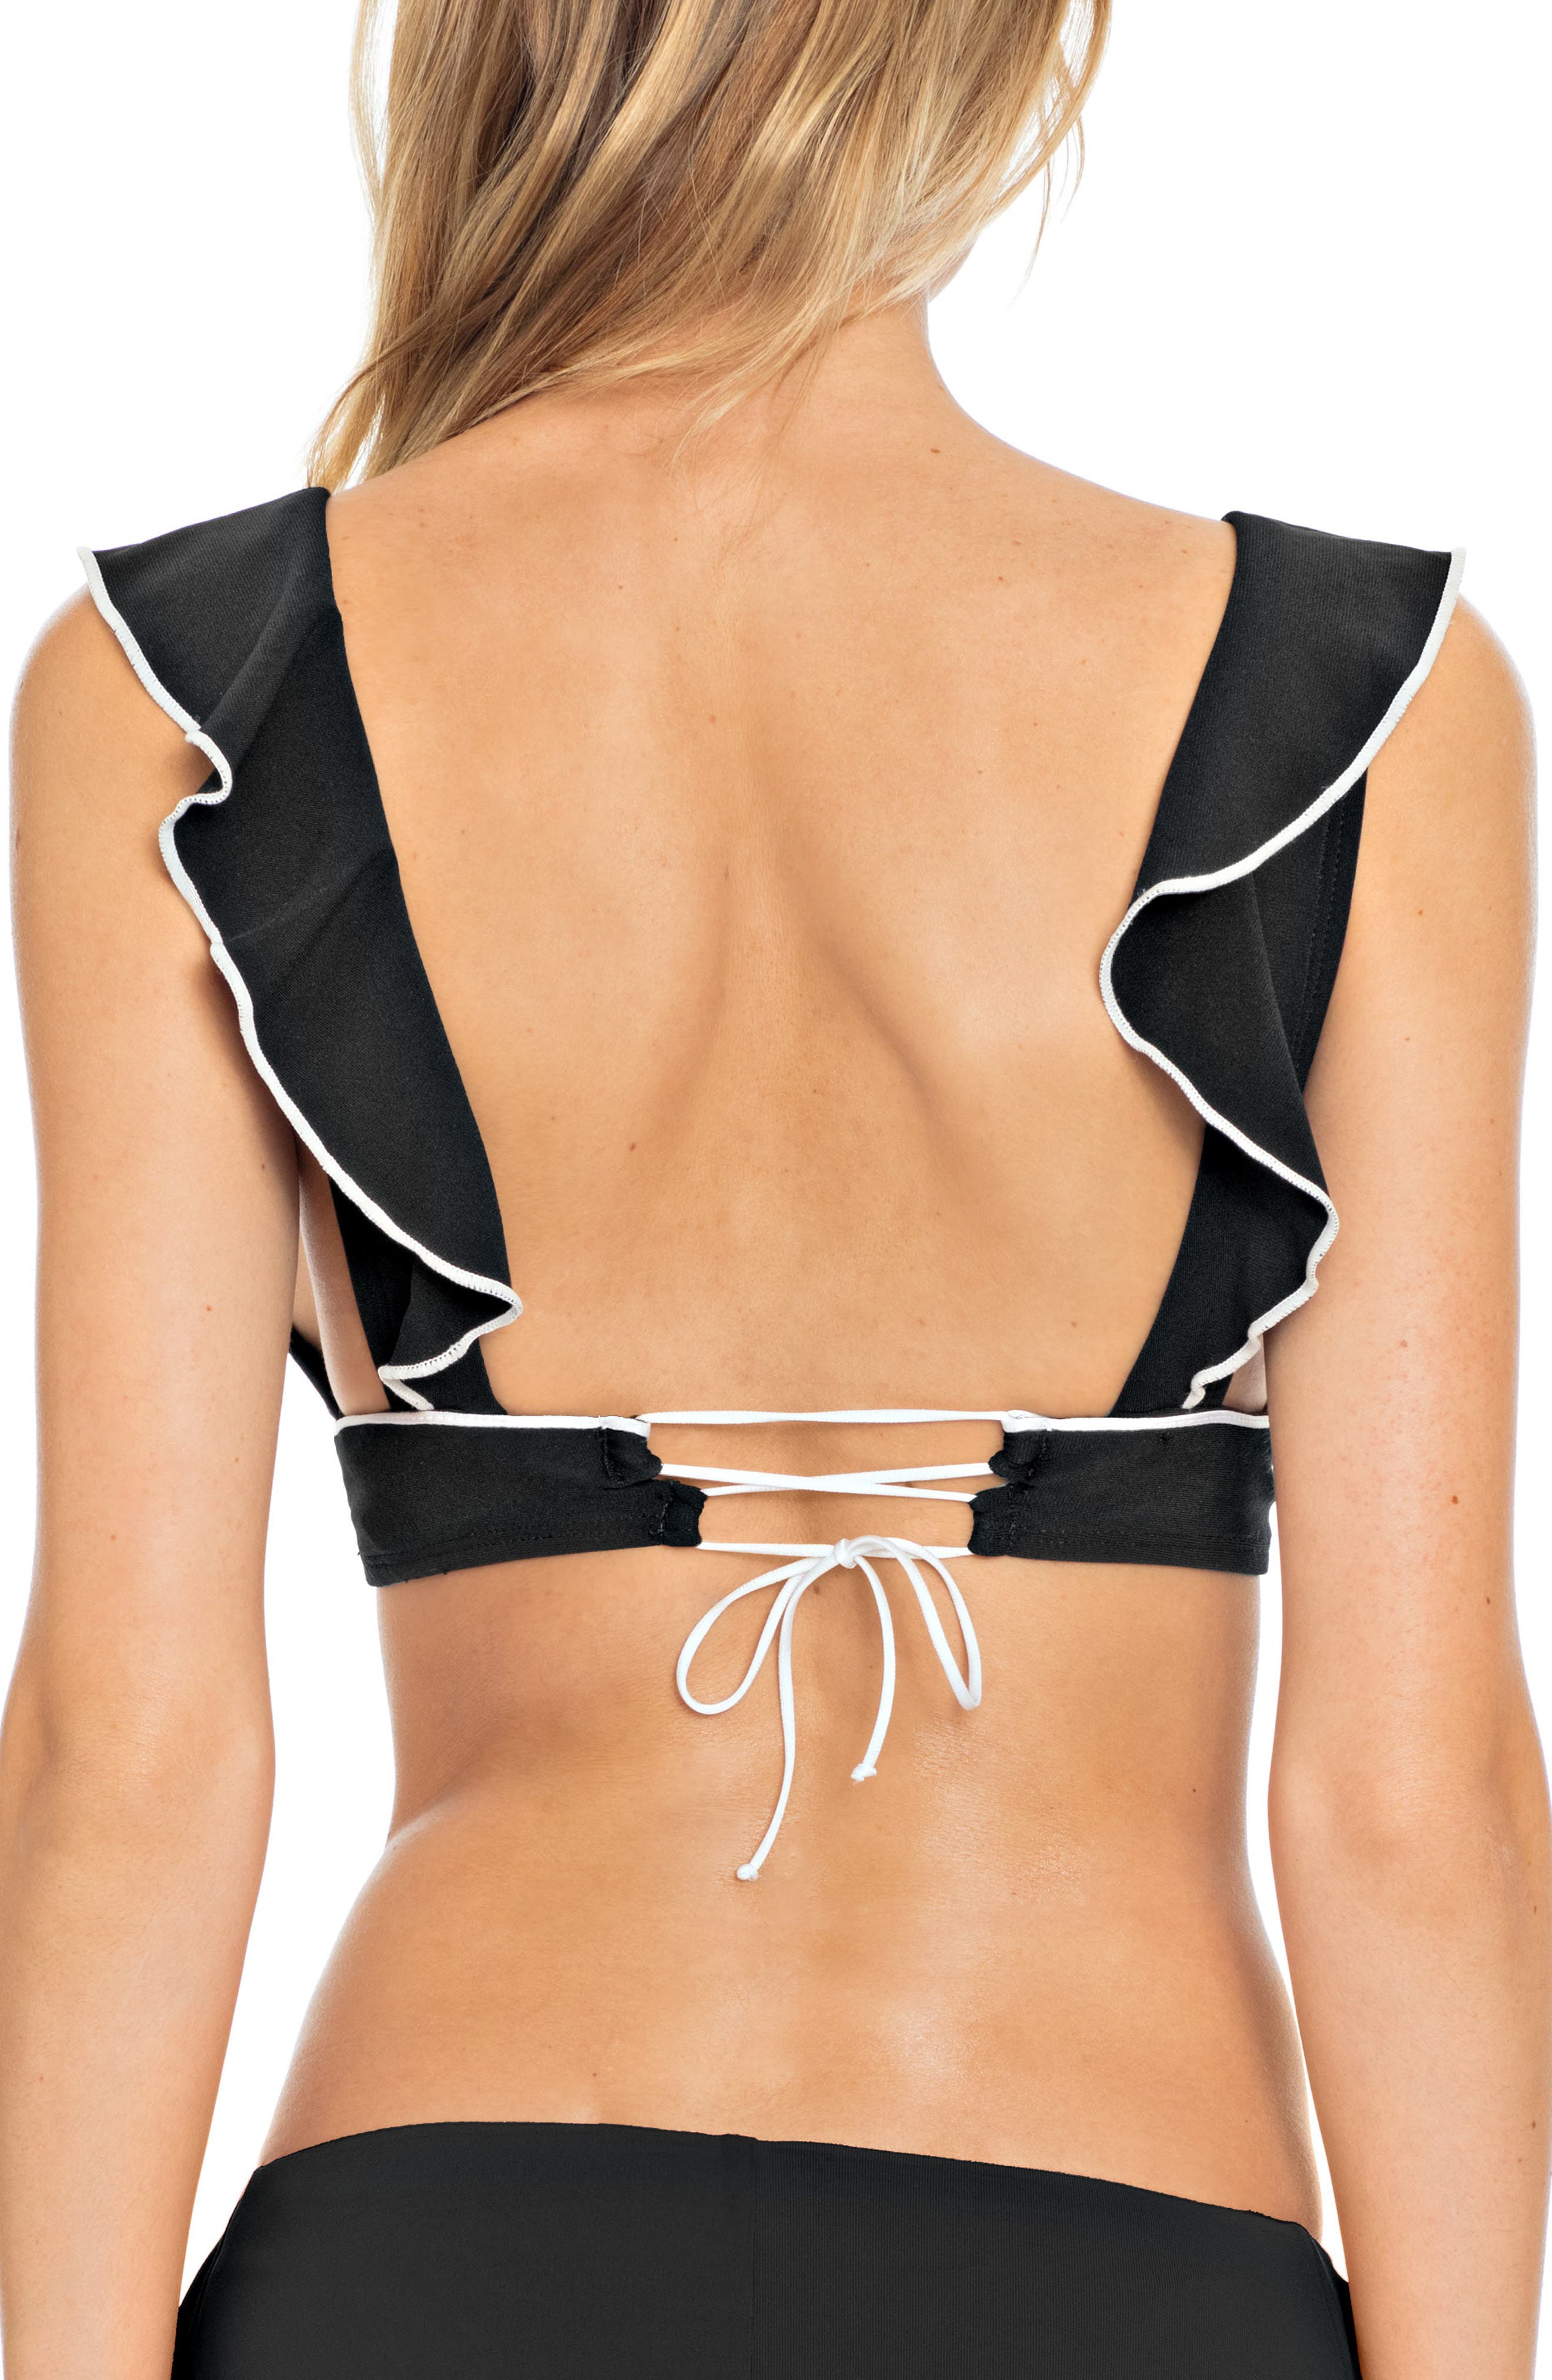 Malia Ruffle Bikini Top,                             Alternate thumbnail 2, color,                             BLACK/ IVORY